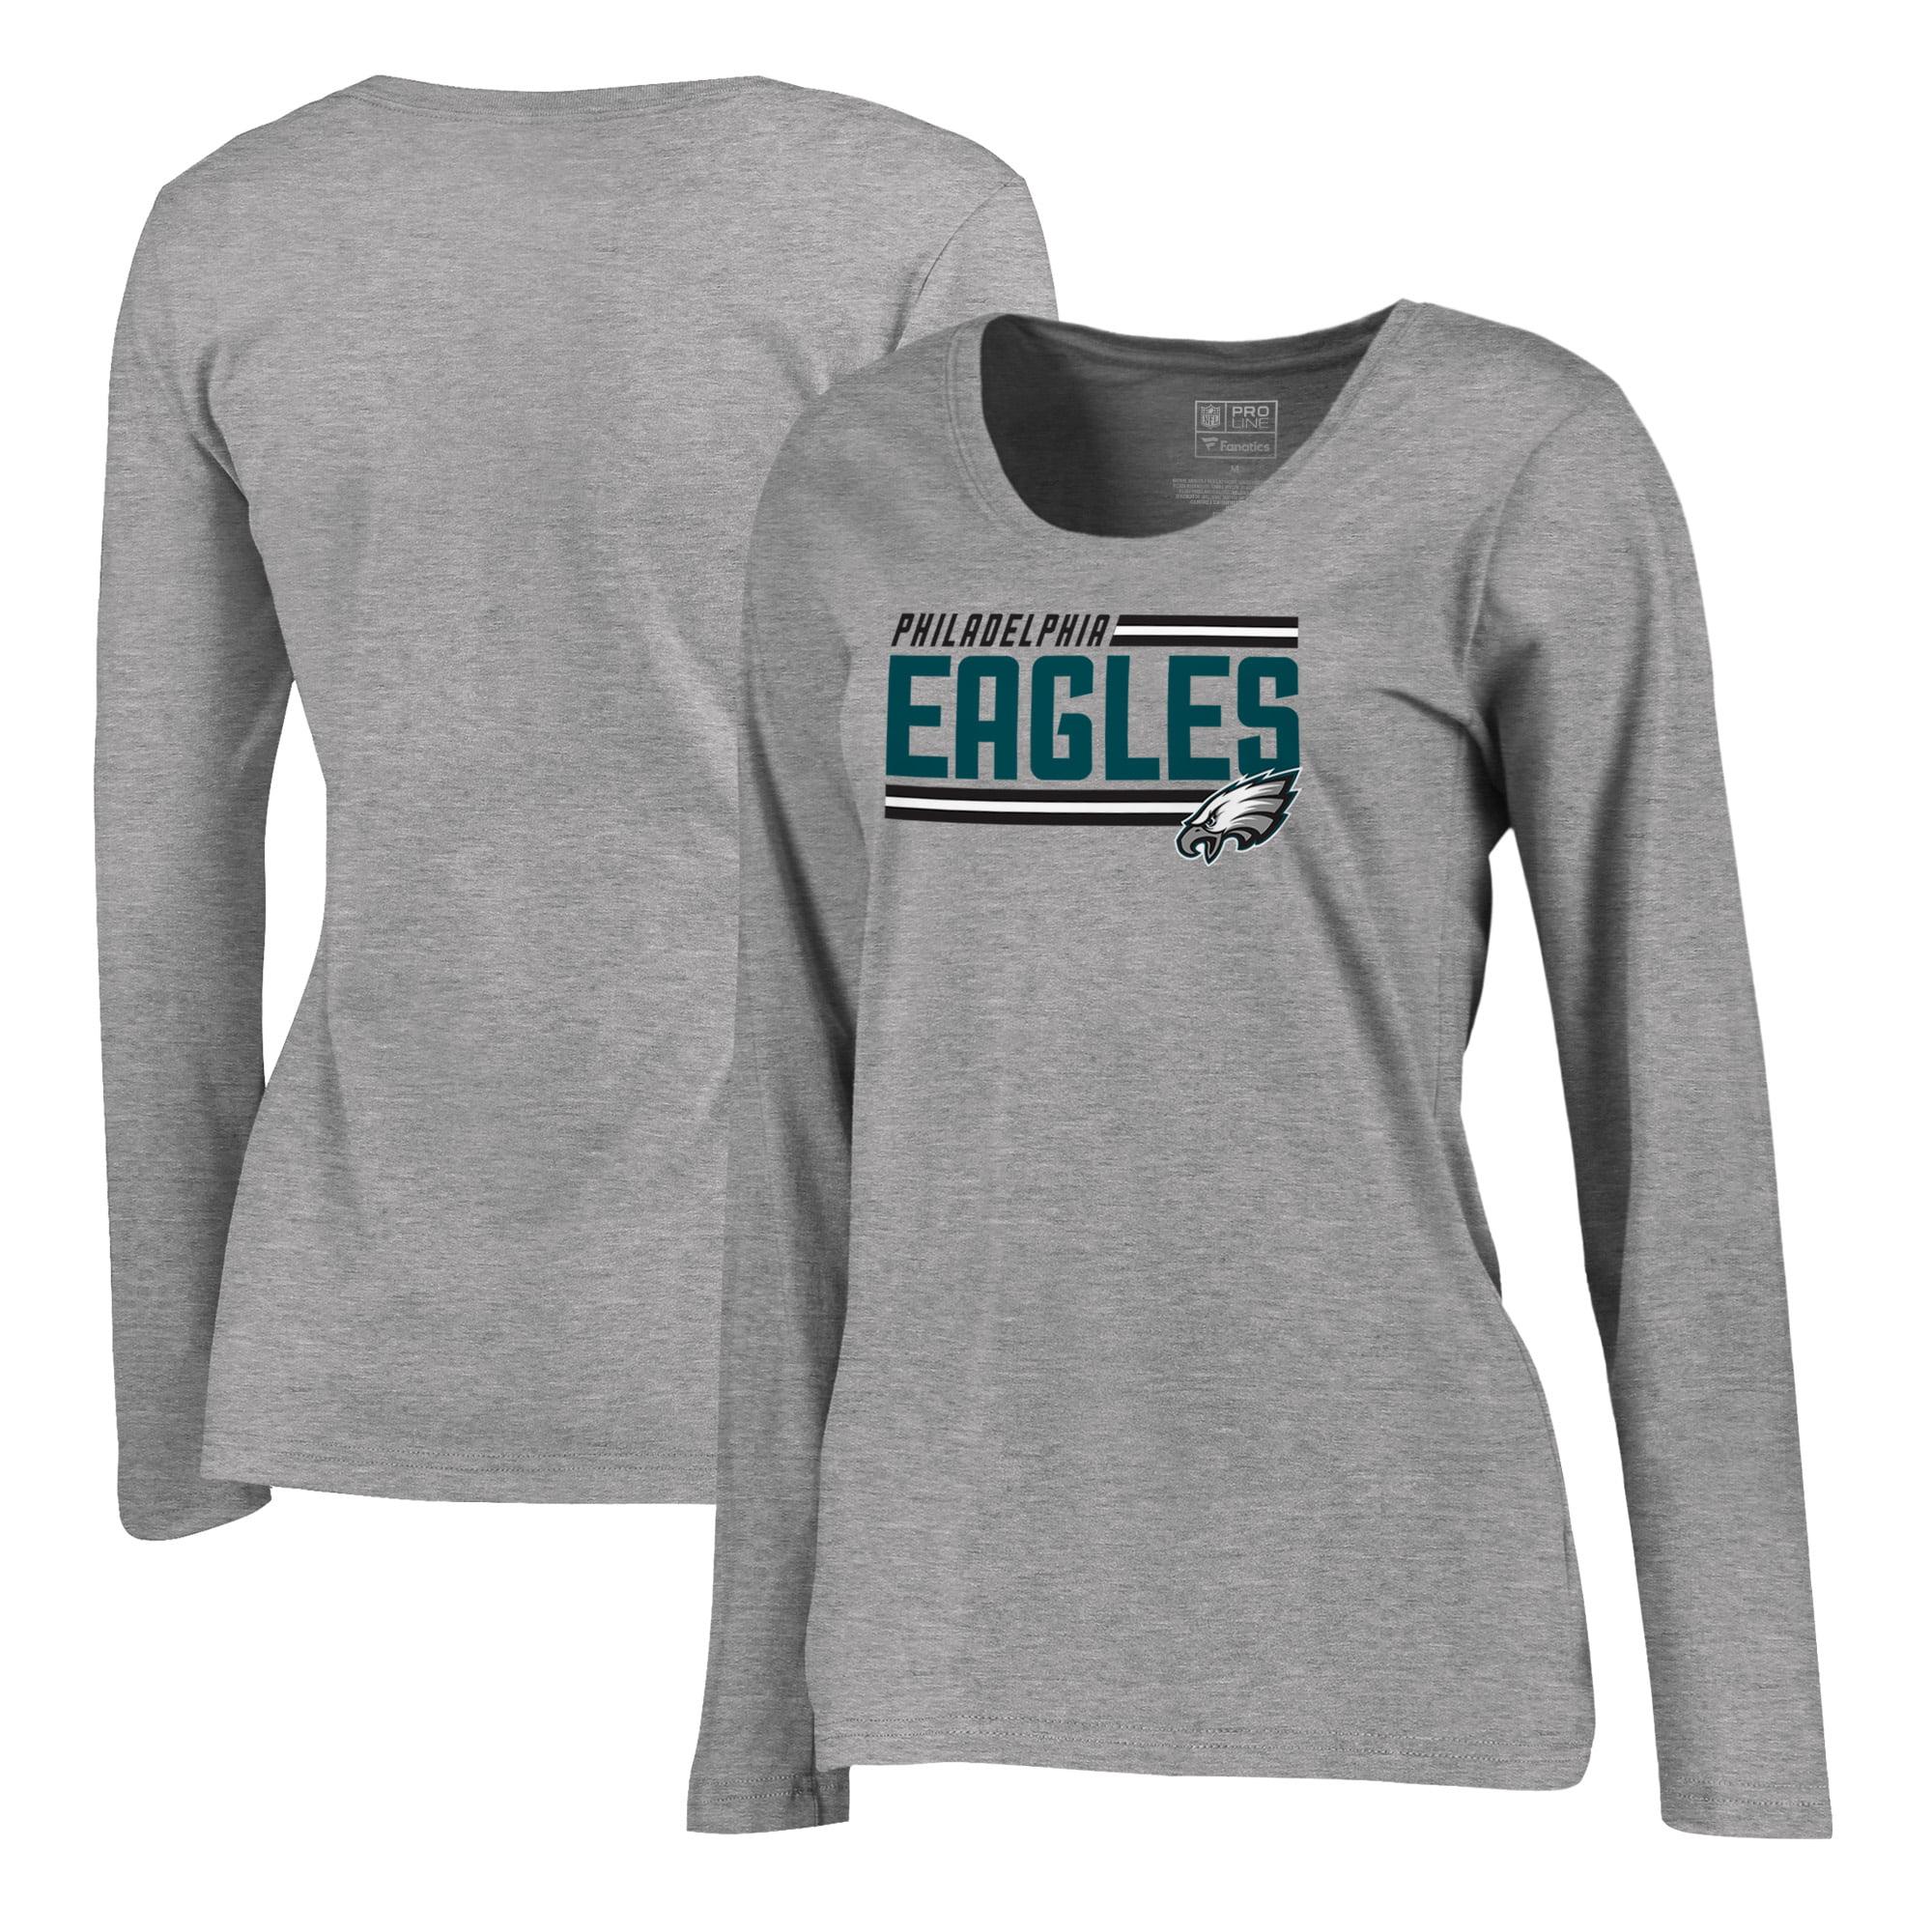 Philadelphia Eagles NFL Pro Line by Fanatics Branded Women's Iconic Collection On Side Stripe Long Sleeve Plus Size T-Shirt - Ash